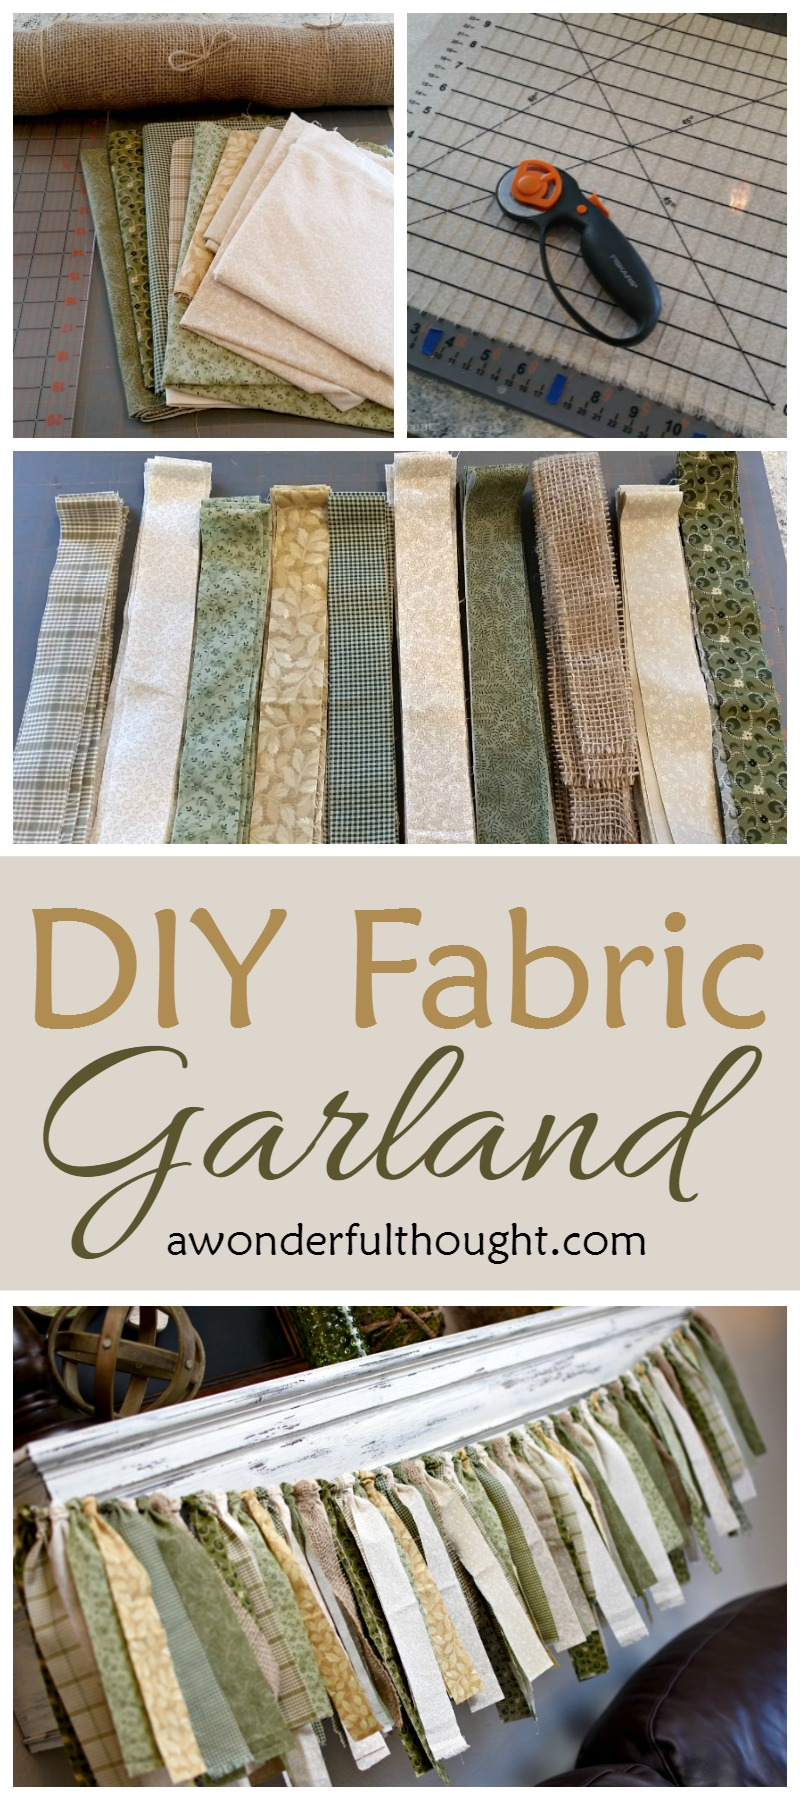 Diy Fabric Garland A Wonderful Thought